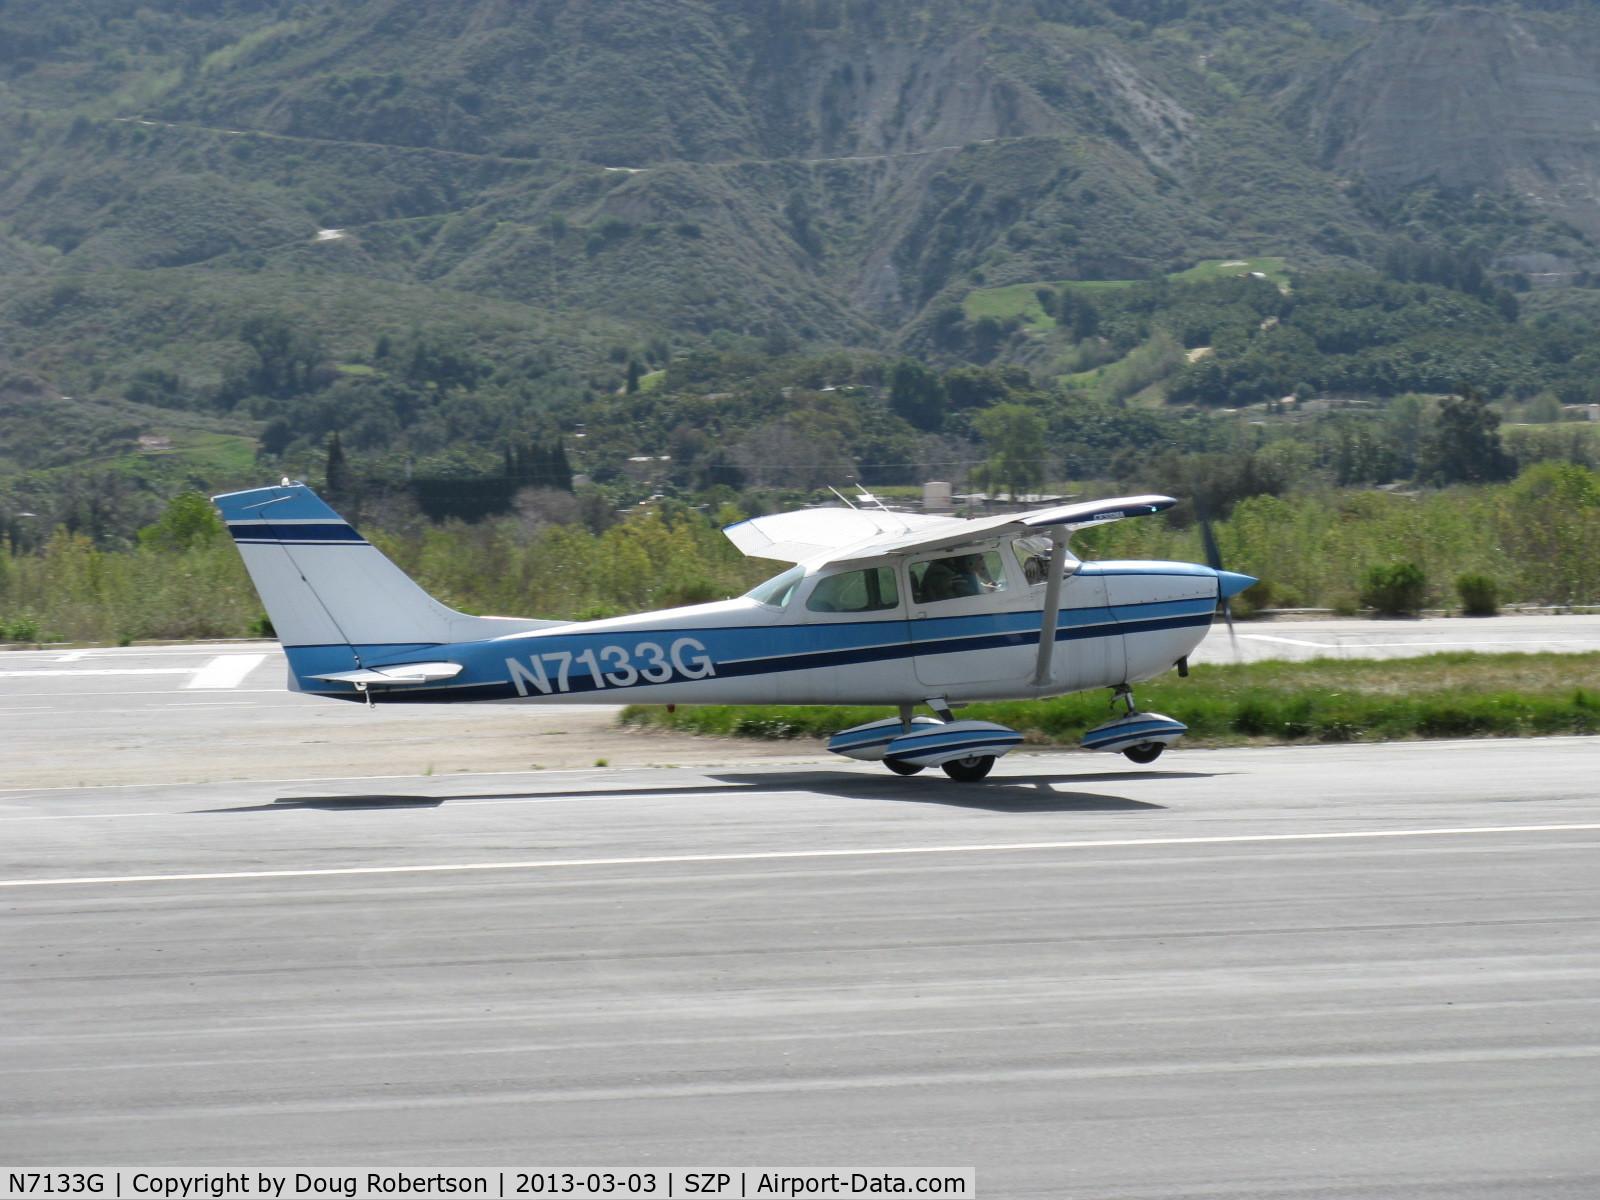 N7133G, 1969 Cessna 172K Skyhawk C/N 17258833, 1969 Cessna 172K, Lycoming O-320-E2D 150 Hp, takeoff roll Rwy 22